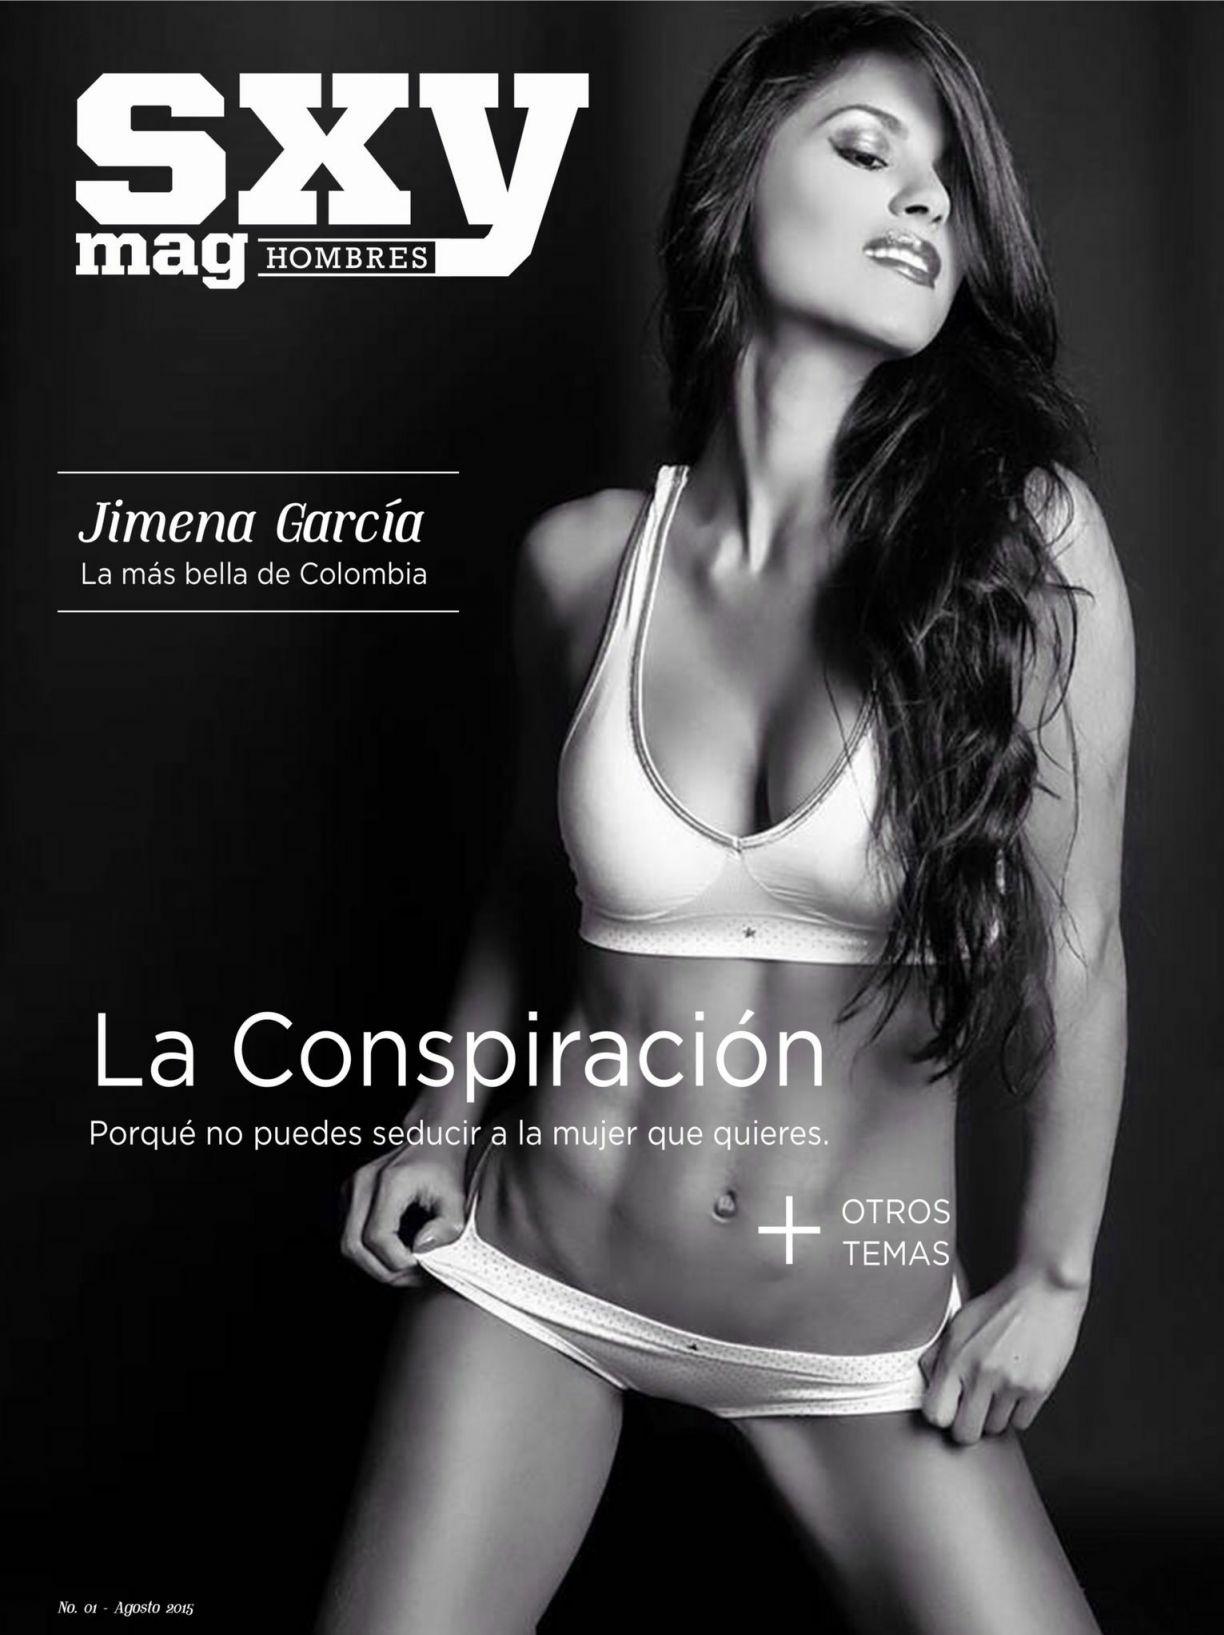 Jimena Garcia SXY mag (1)